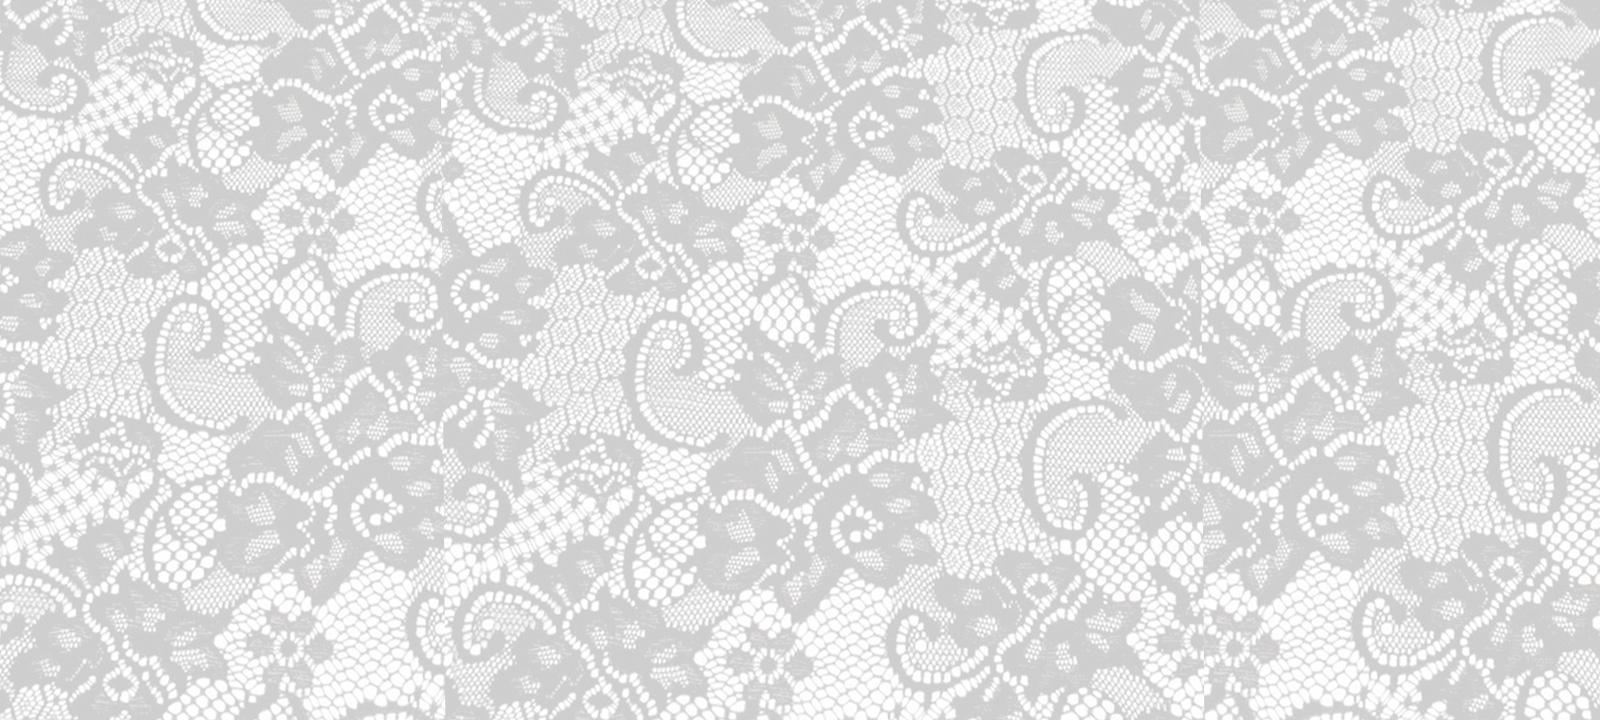 black-lace-2362801.jpg